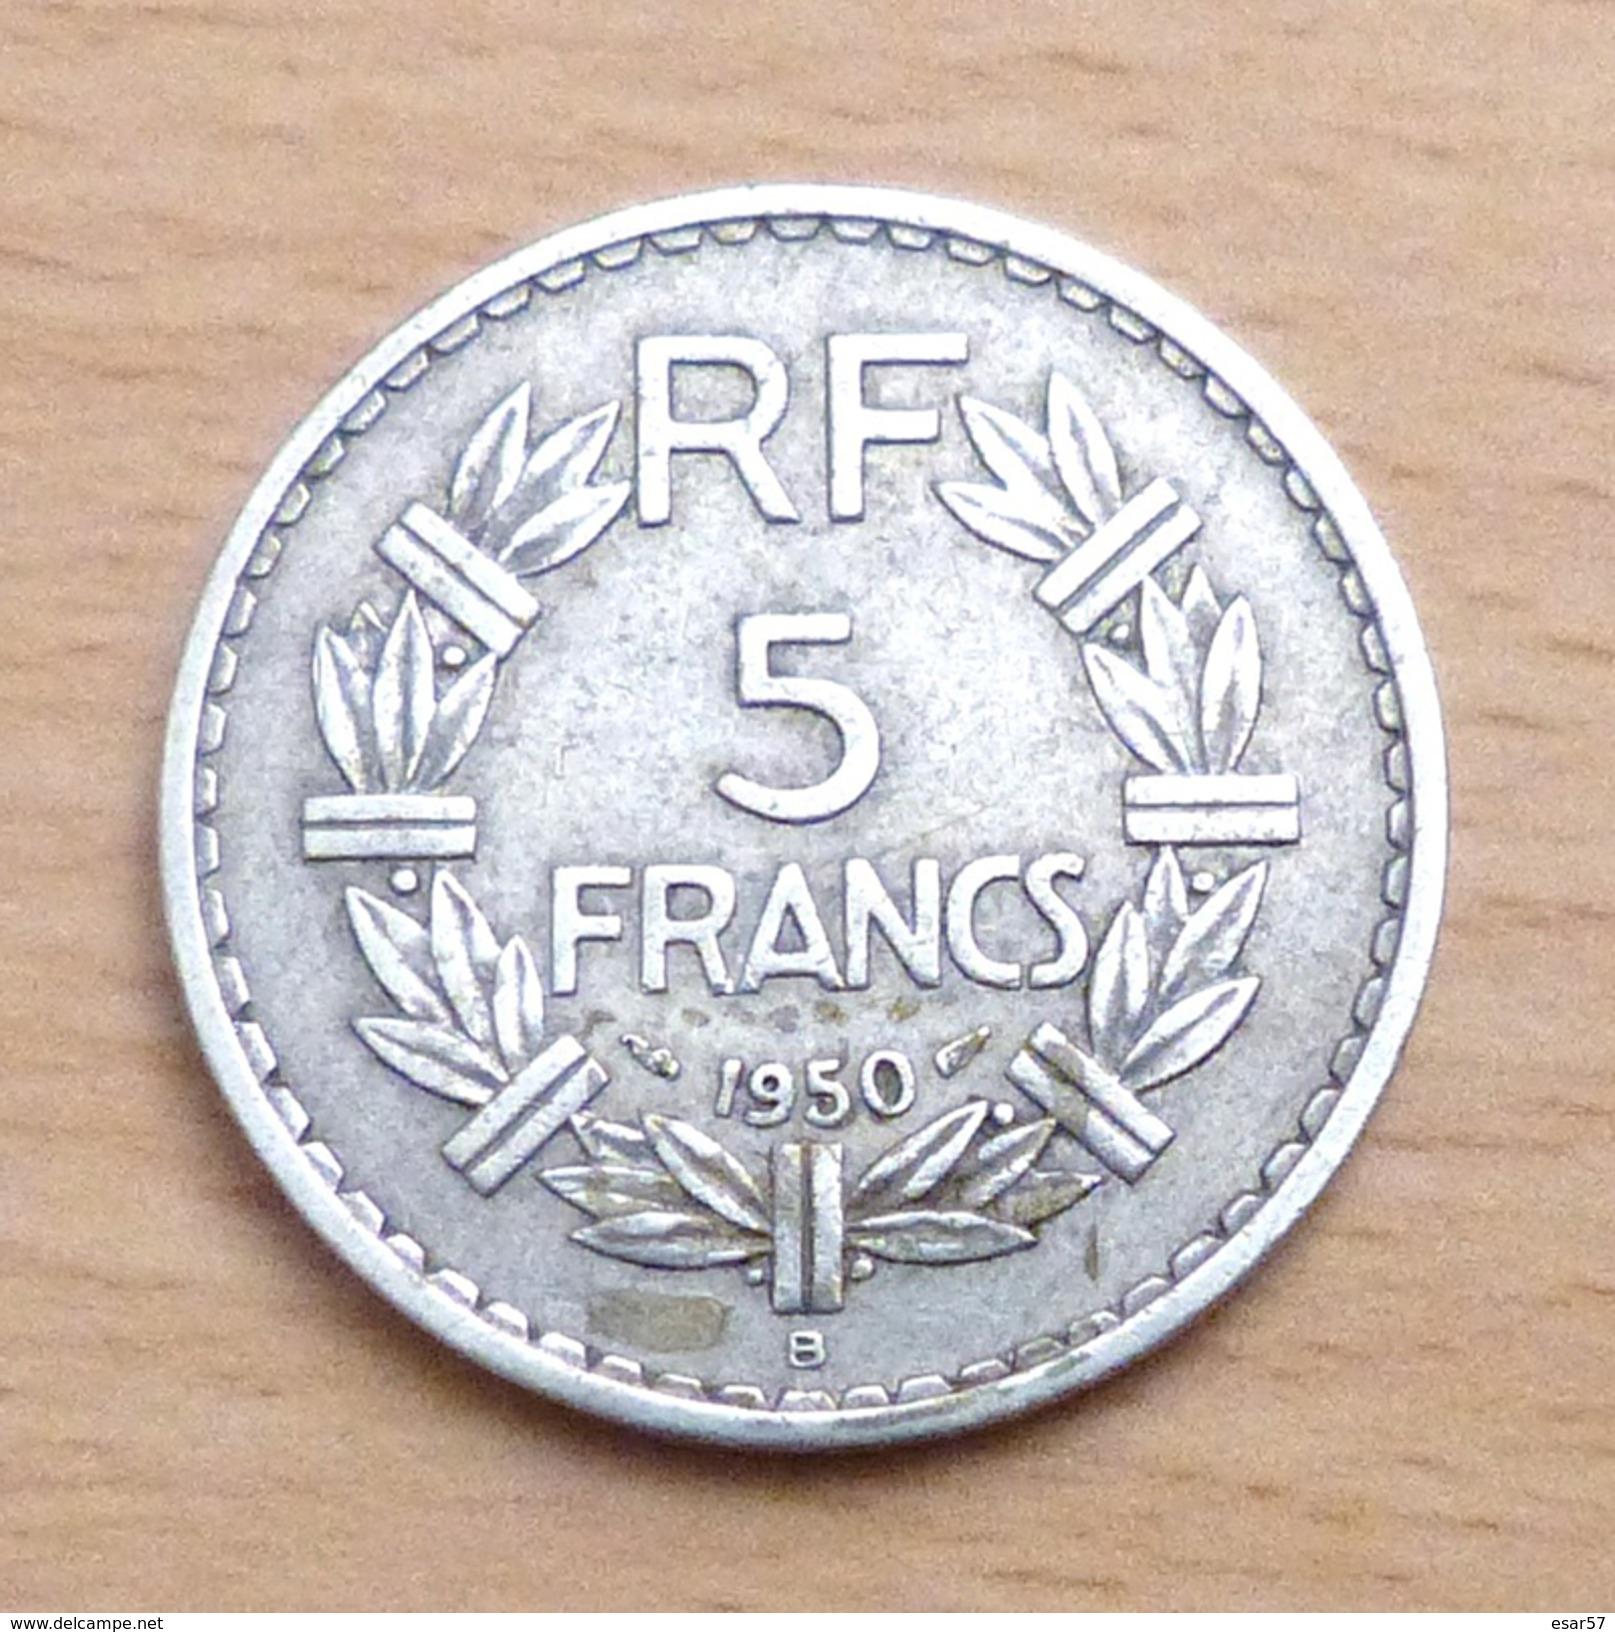 5 FRANCS LAVRILLIER 1950 B EN ALUMINIUM - France